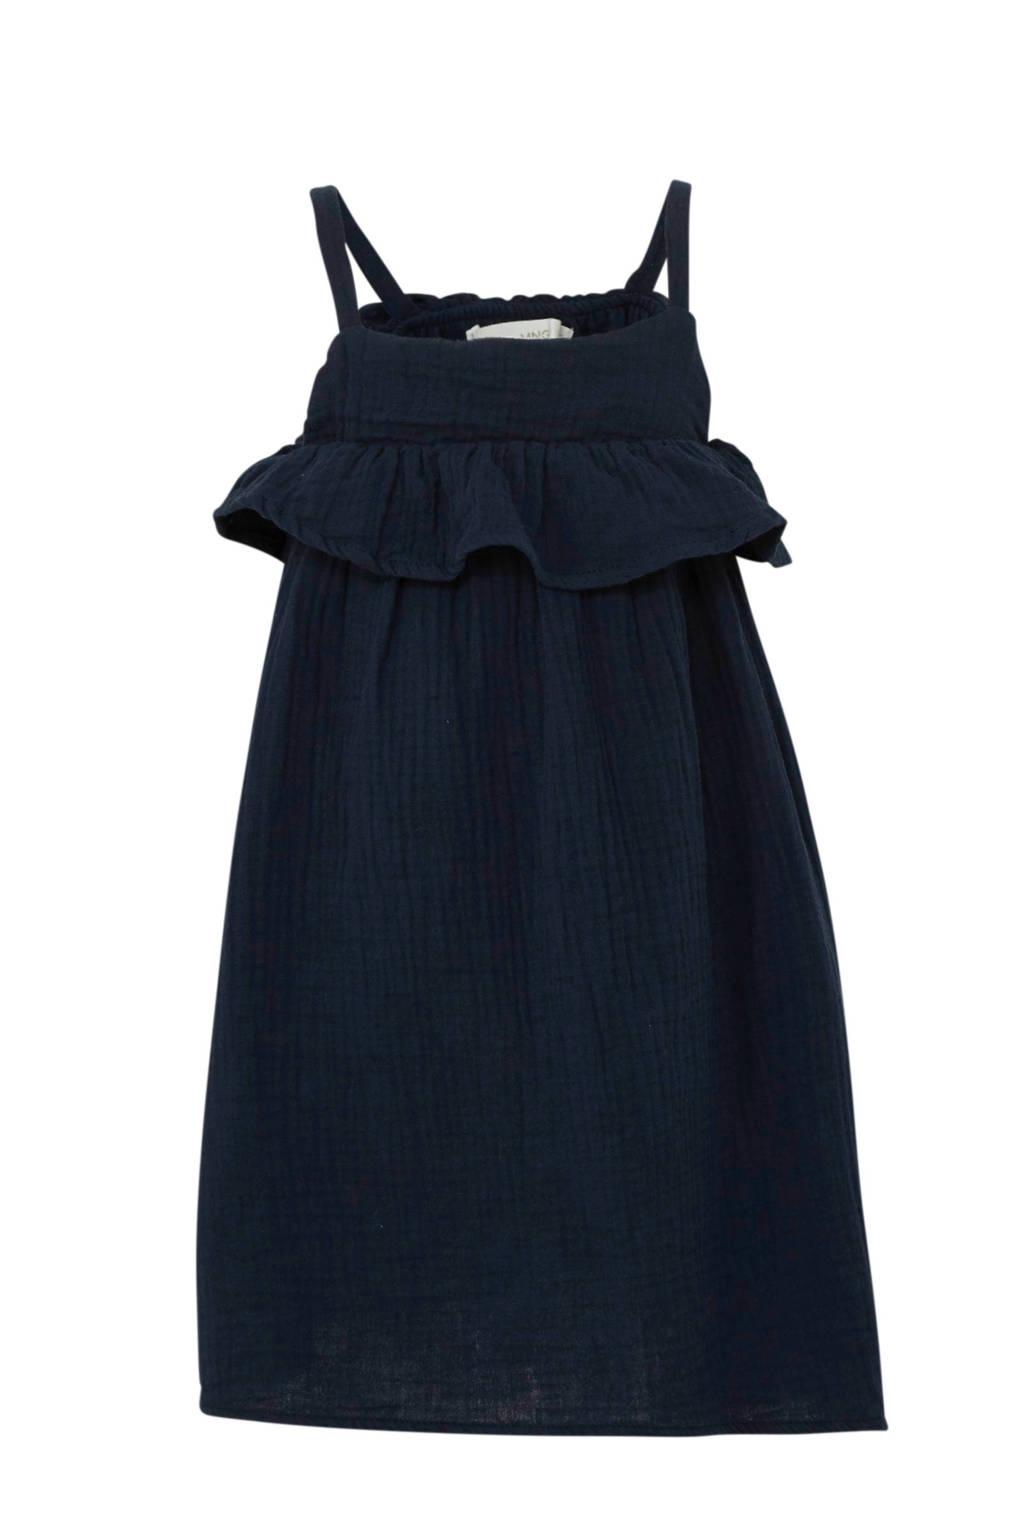 Mango Kids jurk met volant blauw, Donkerblauw